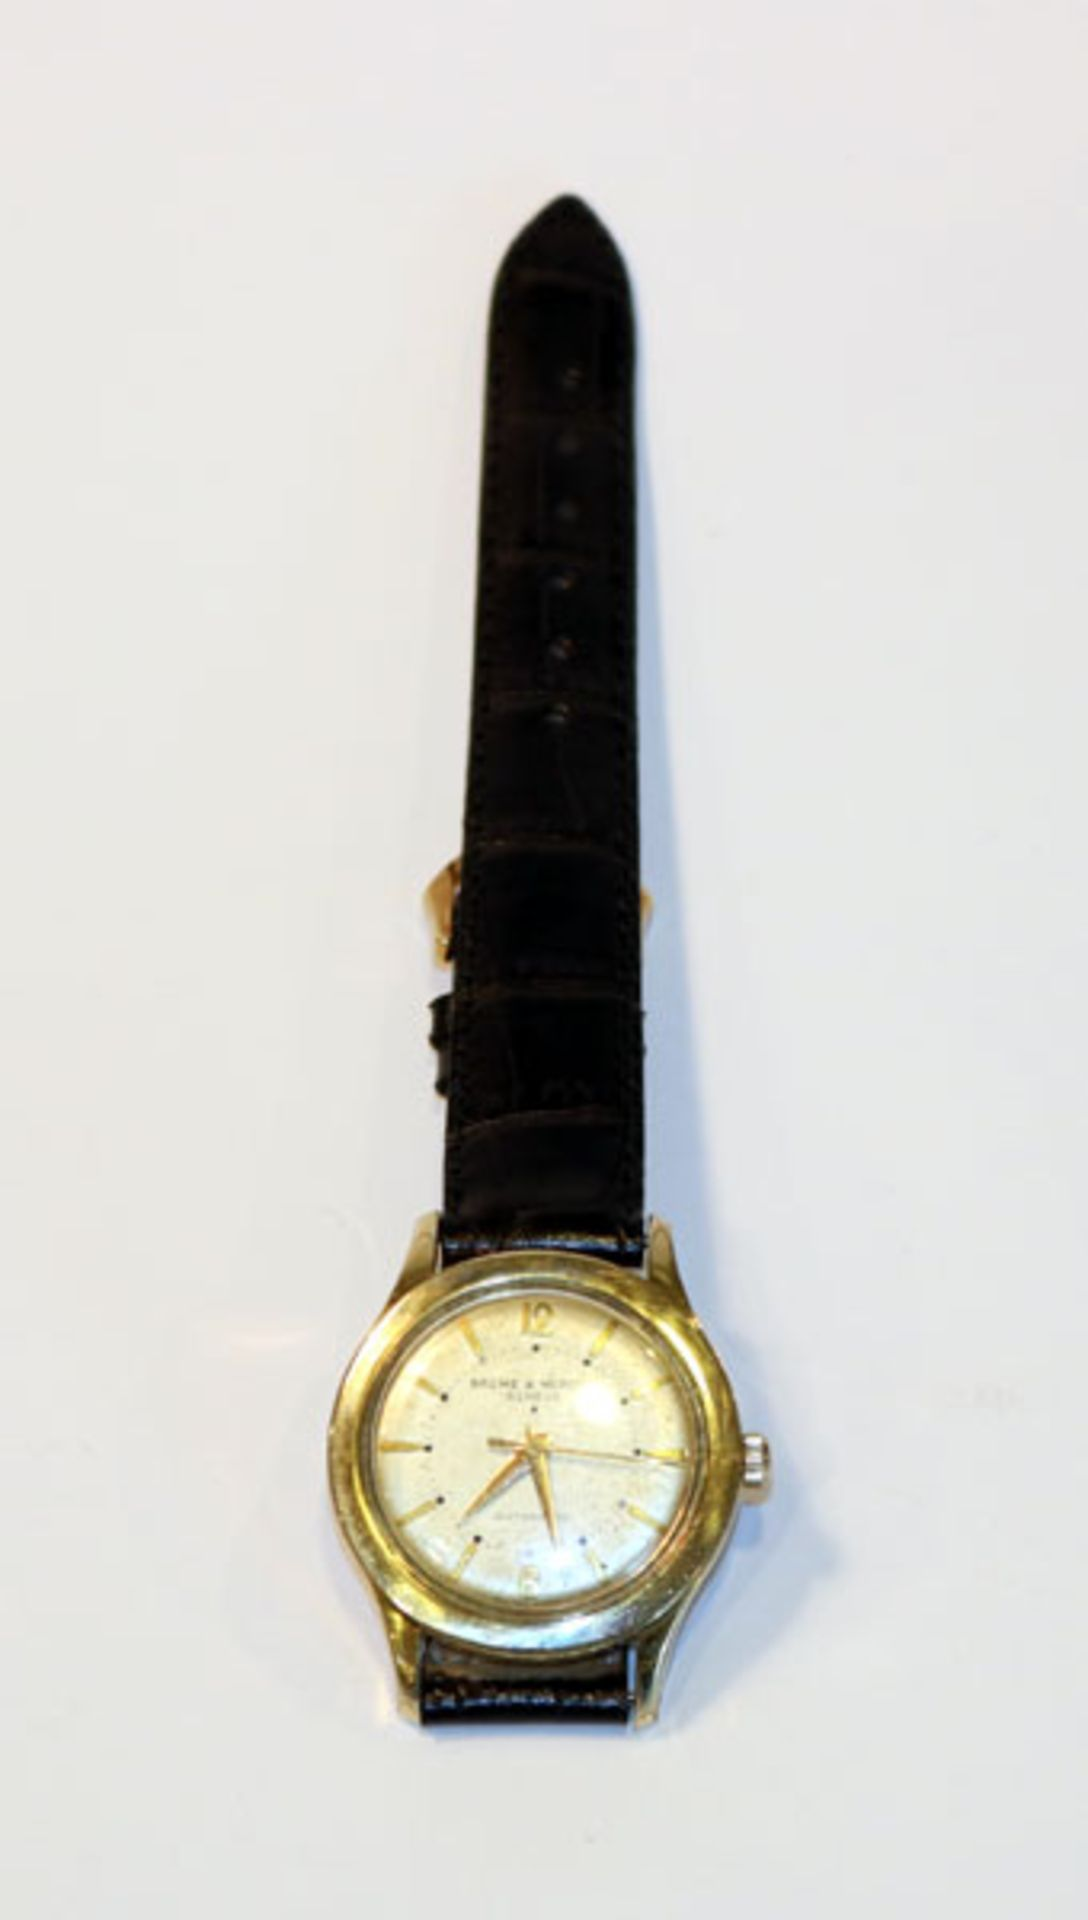 Baume & Mercier Genéve Automatic Herren Armbanduhr, Doublé Gehäuse, um 1960, an schwarzem Armband,